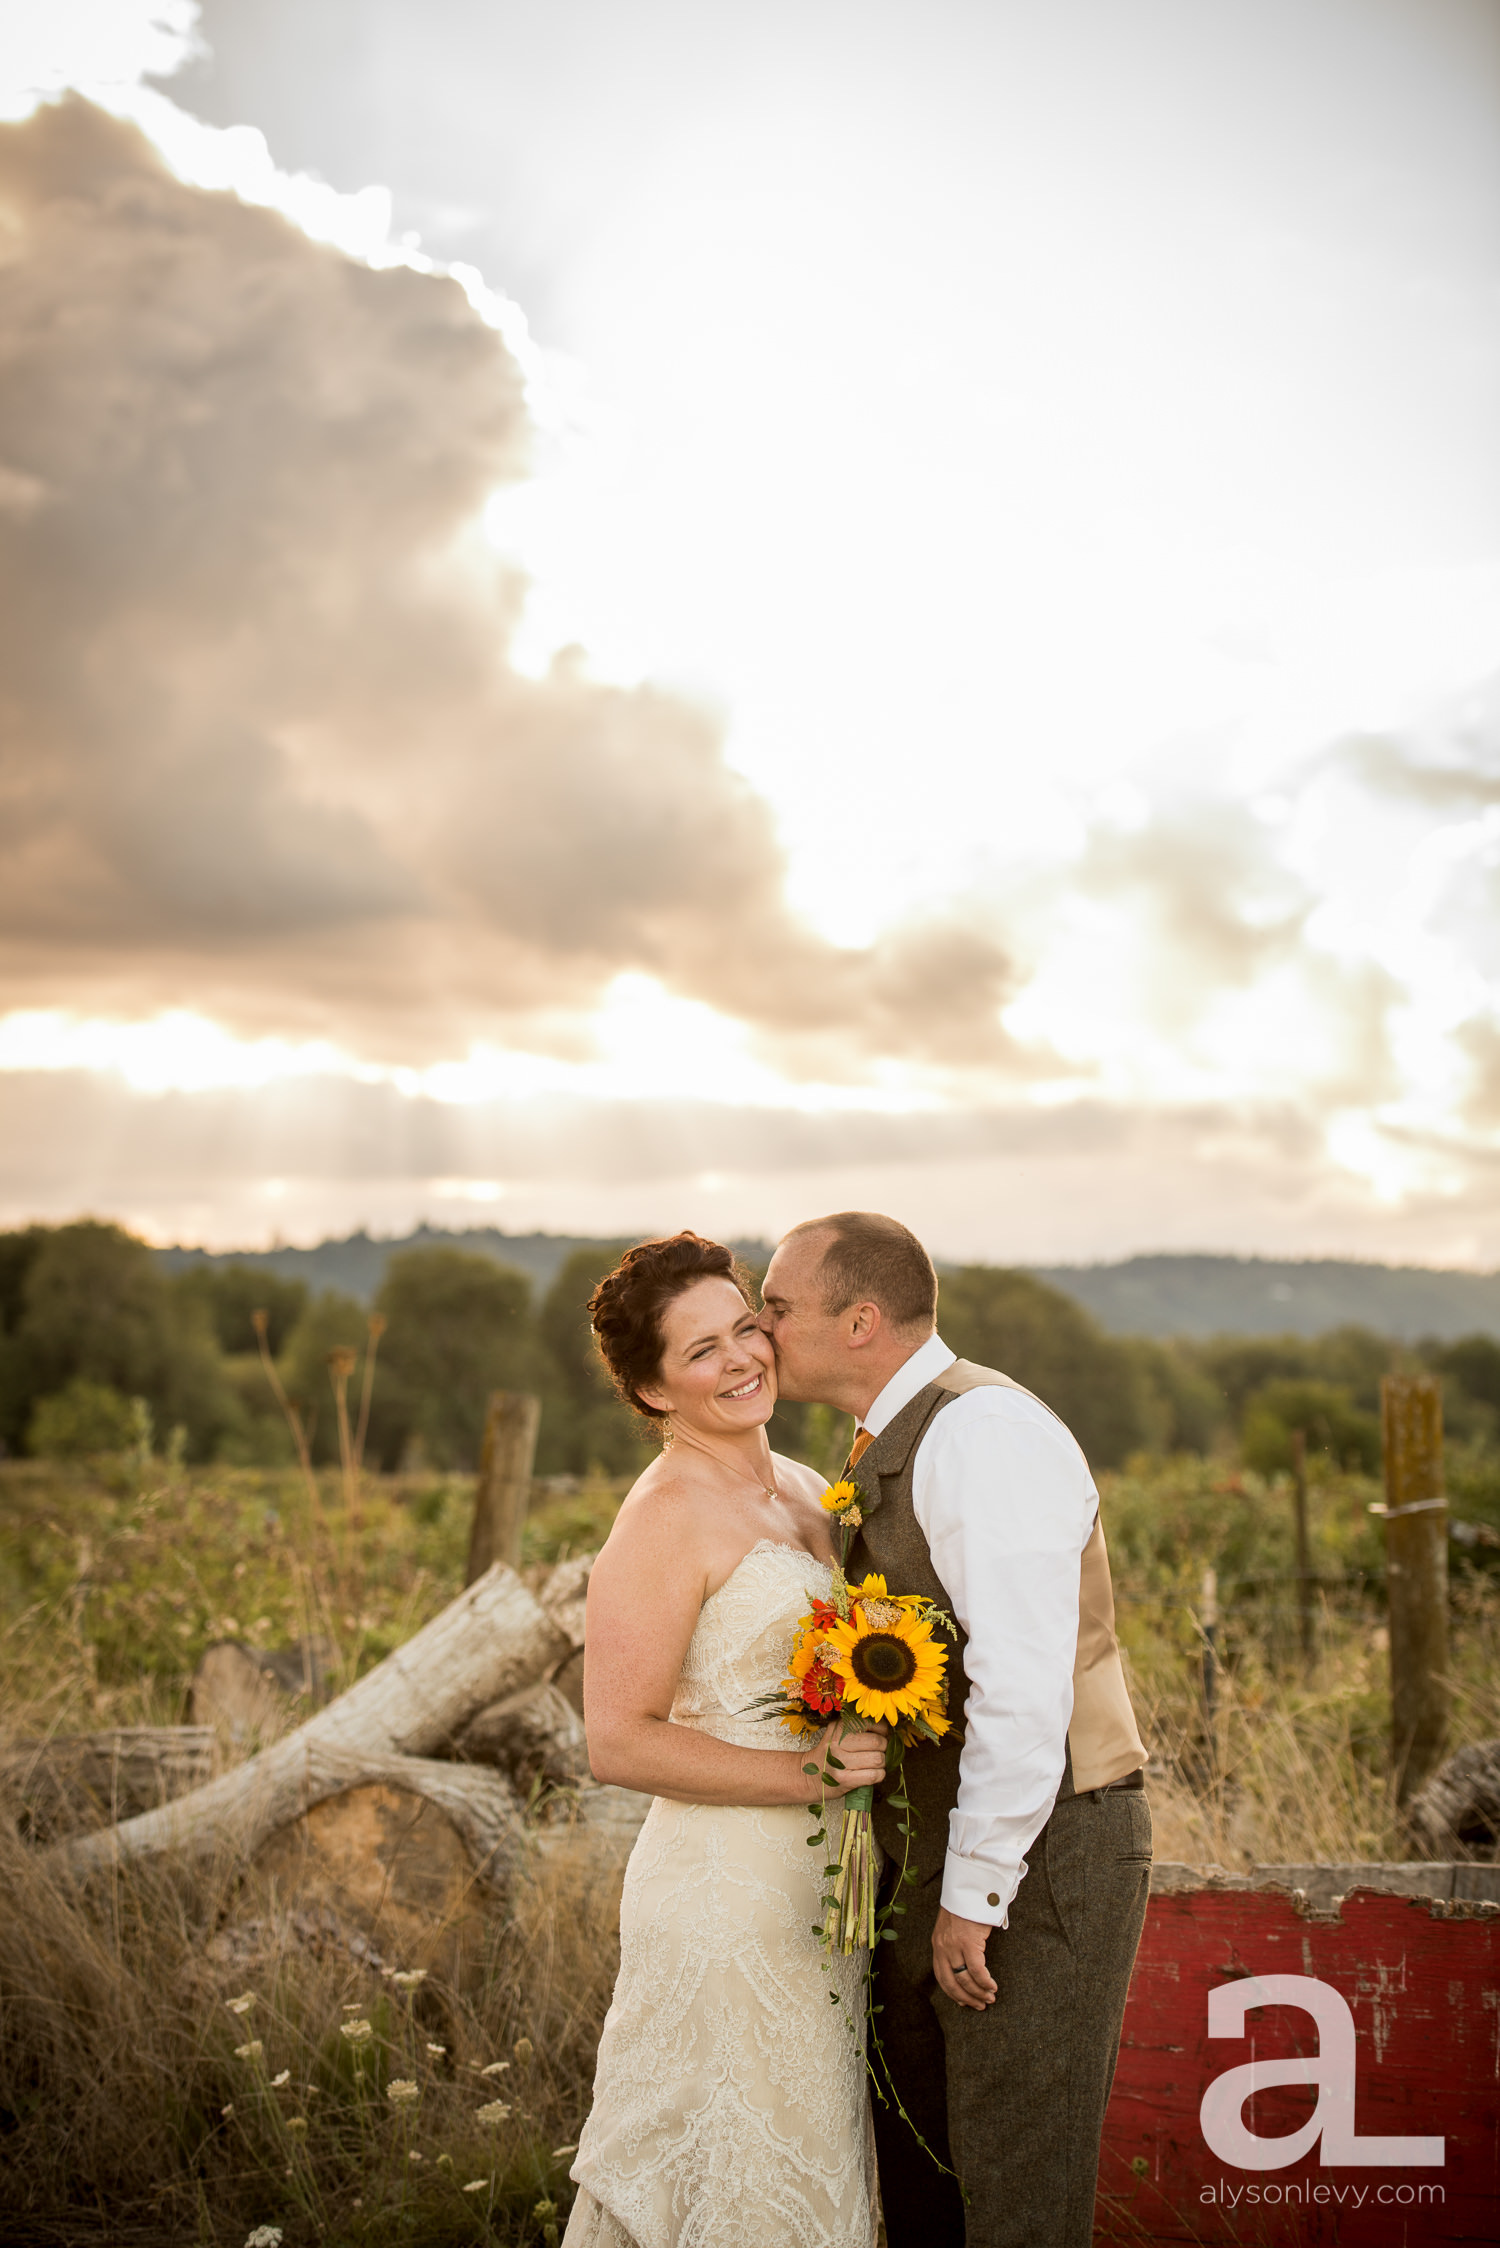 Krugers-Farm-Sauvie-Island-Wedding-Photography-019.jpg